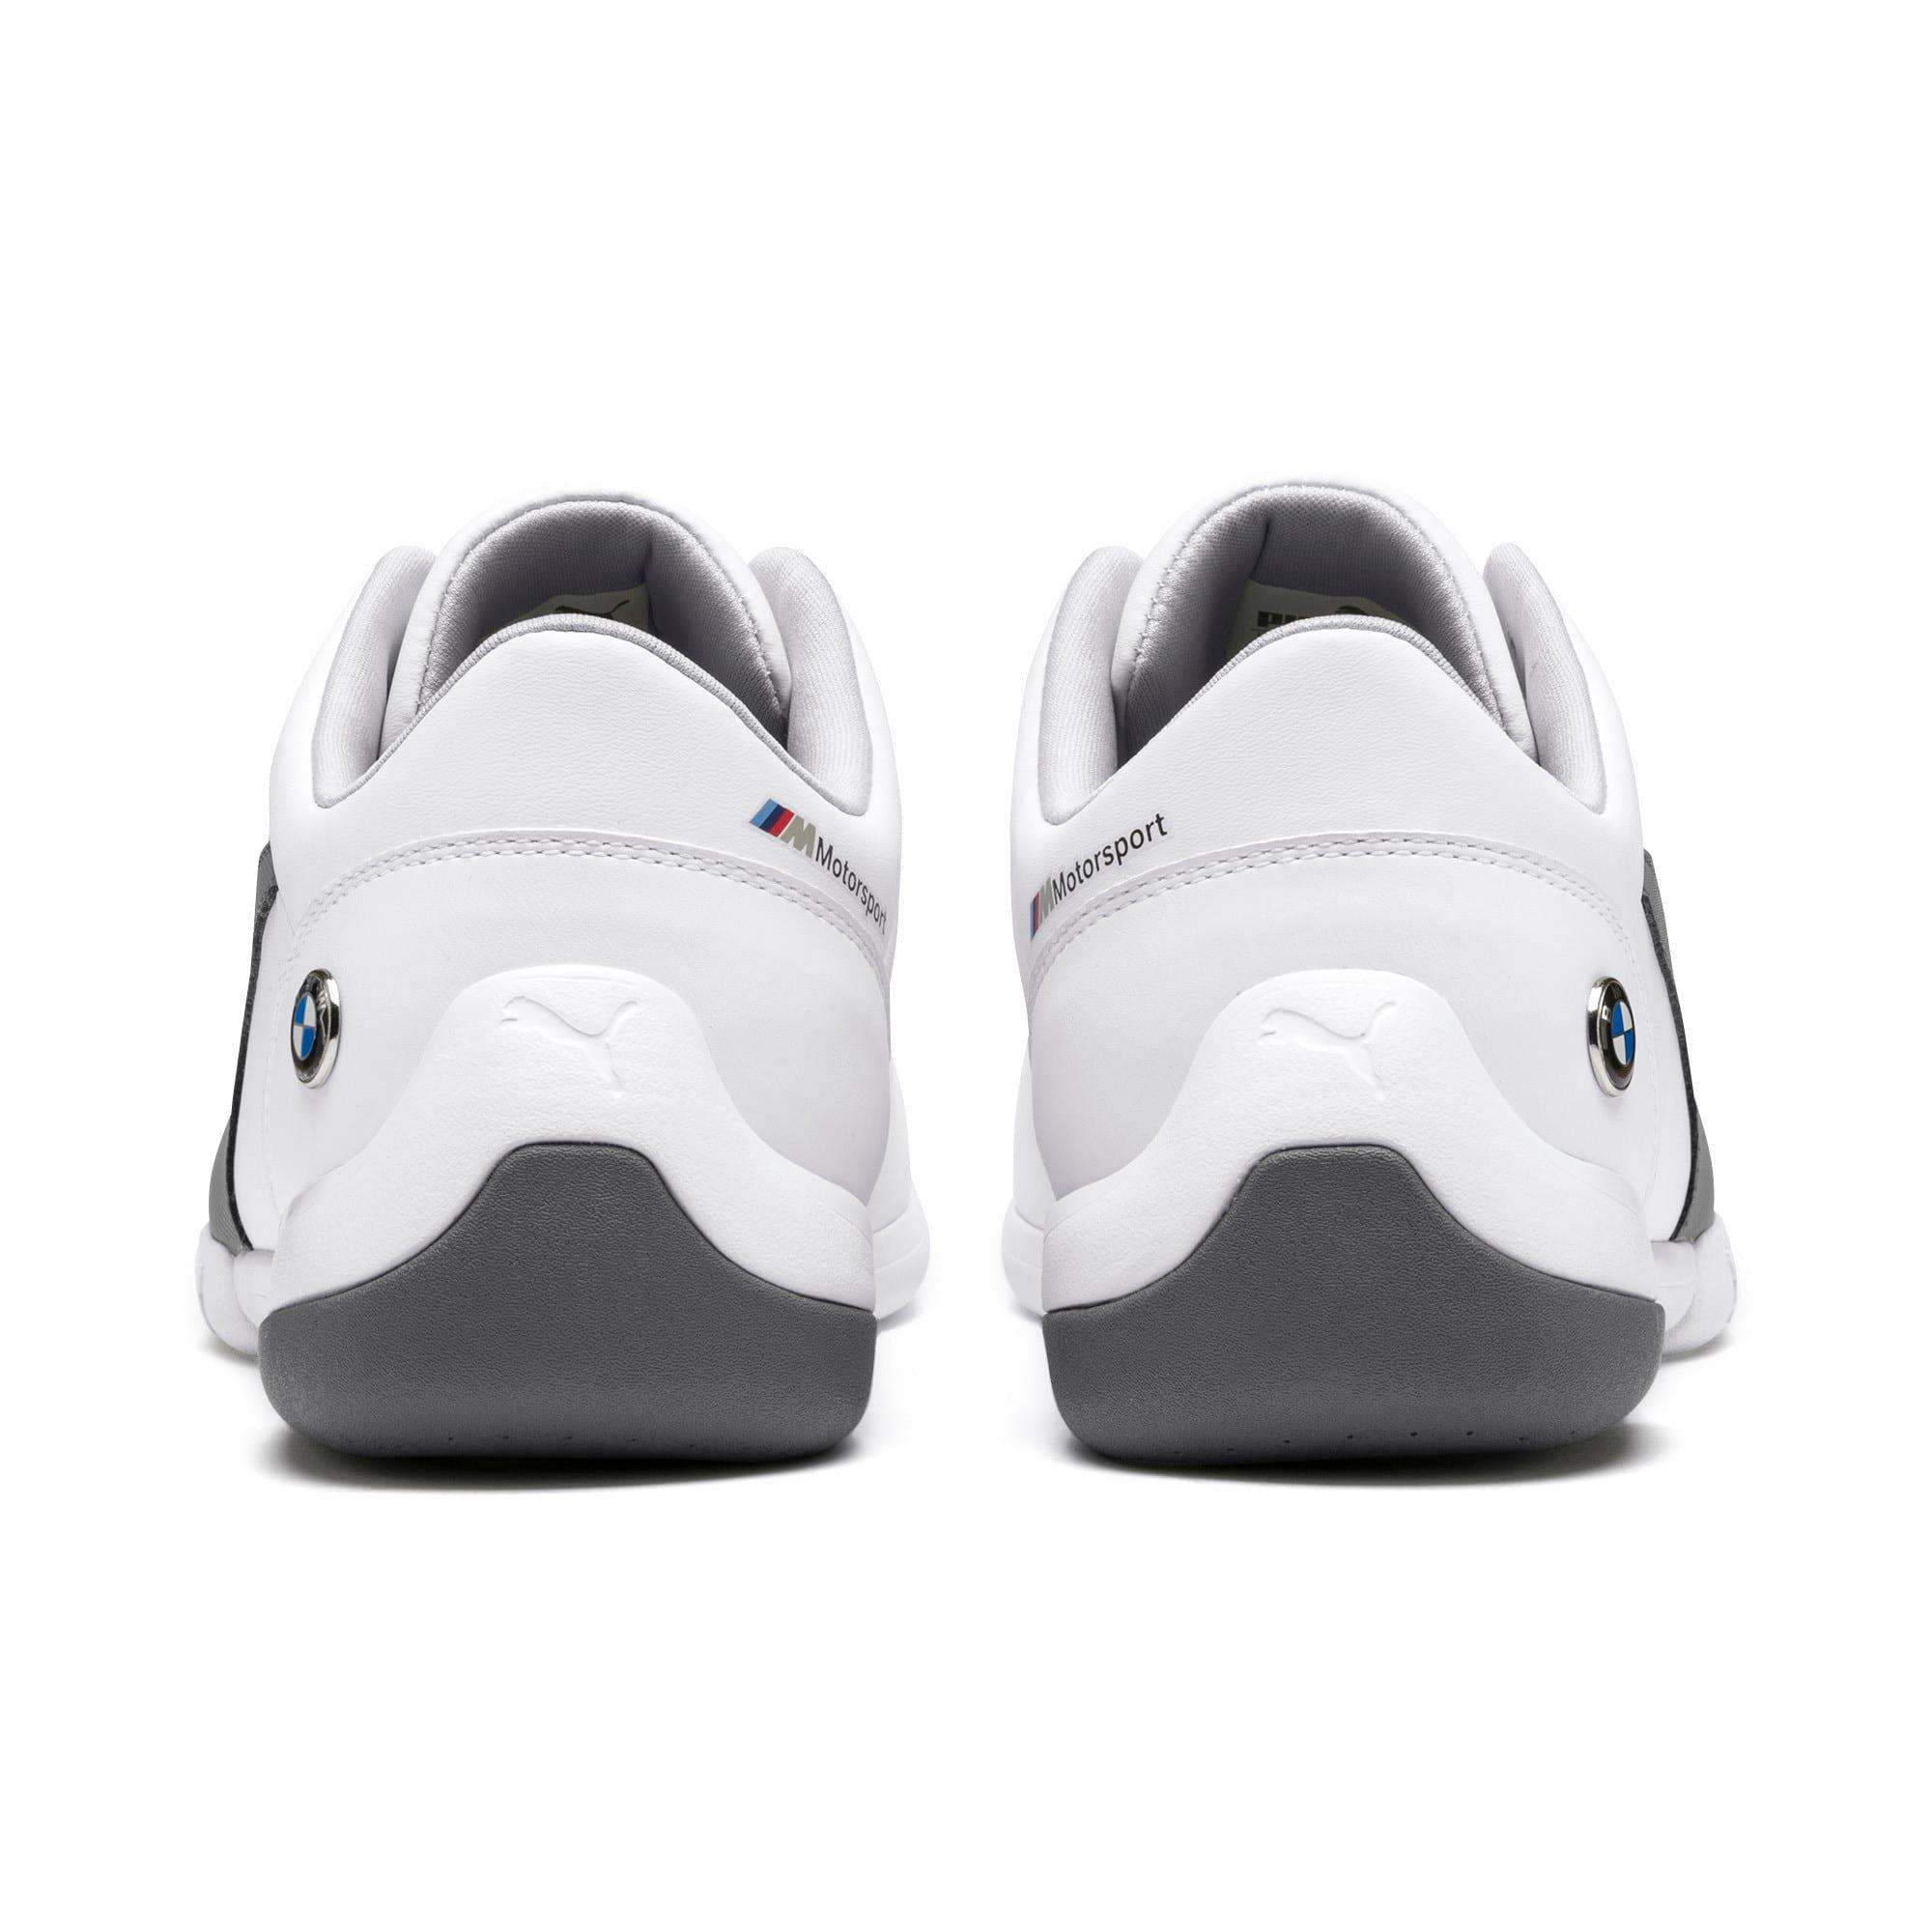 Thumbnail 4 of BMW M Motorsport Kart Cat III Shoes, Puma White-Smoked Pearl, medium